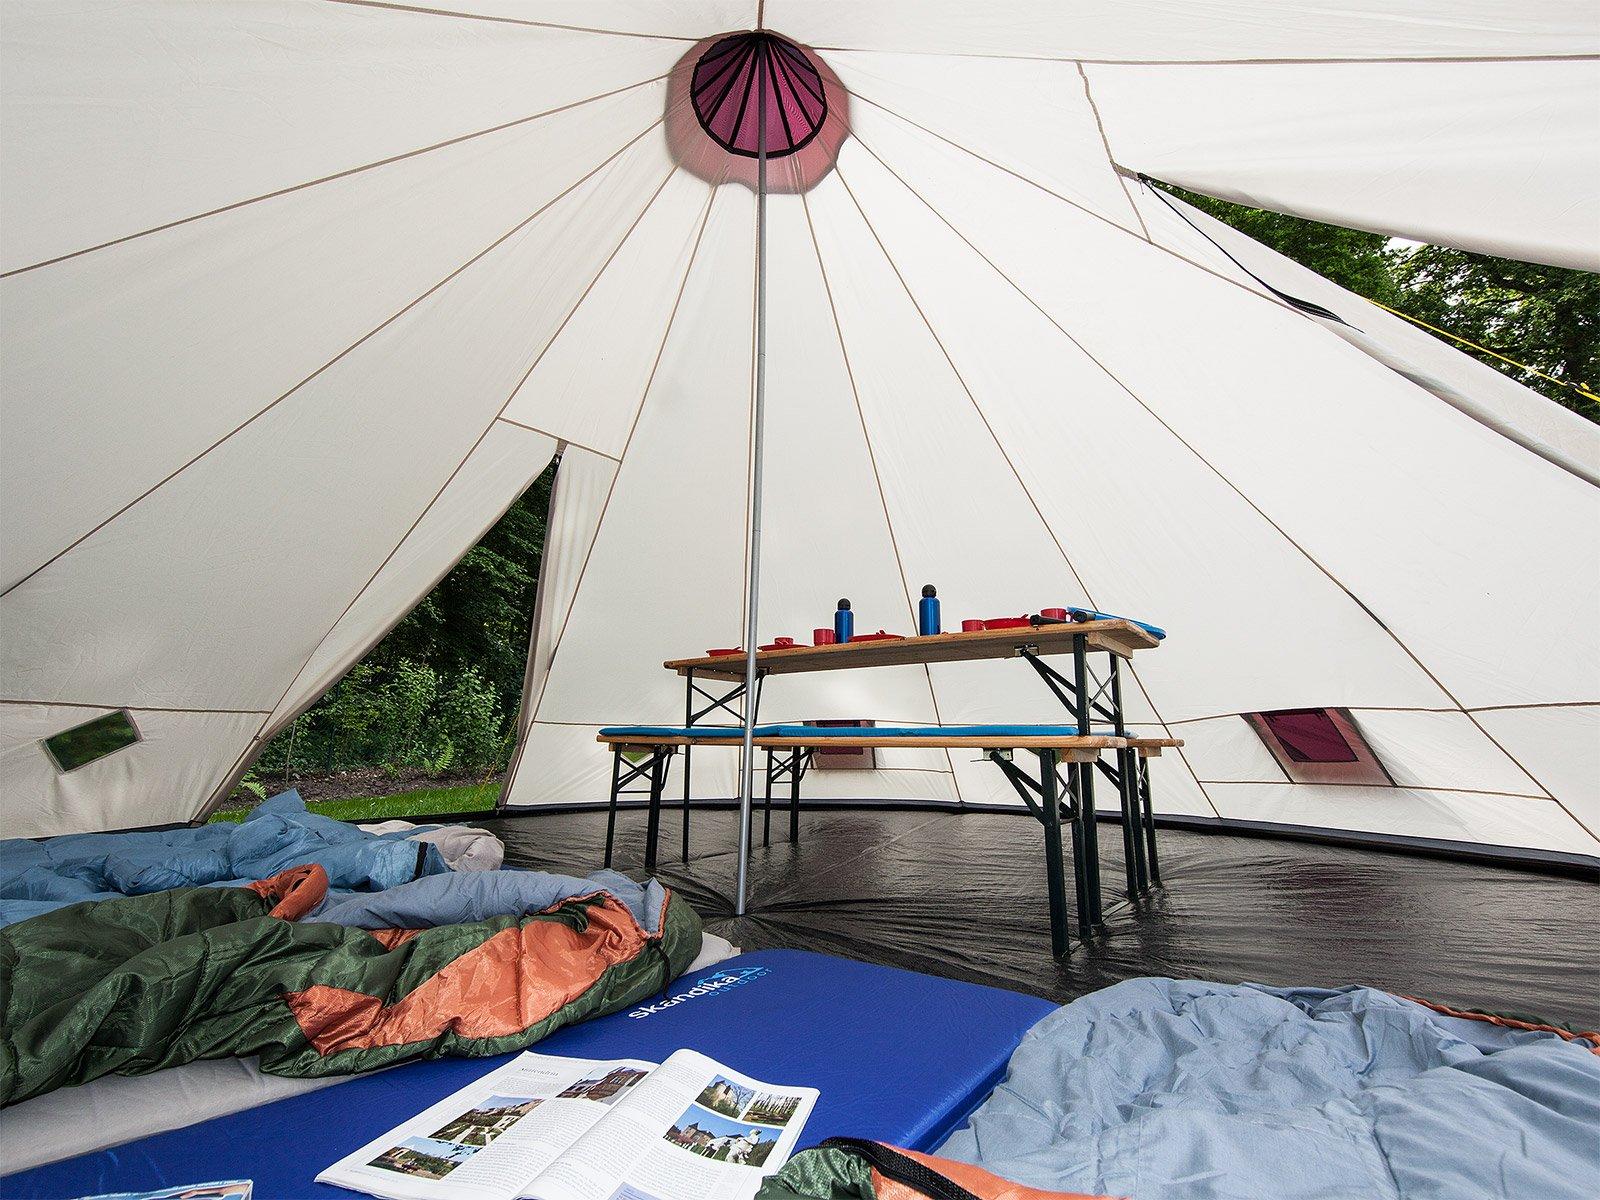 Skandika Teepee 301 Wigwam Style Indiana Tepee Tent, Sewn-In Groundsheet, 300 cm Peak Height, 3000 mm Water Column, Sand/Burgundy, 12-Person 5